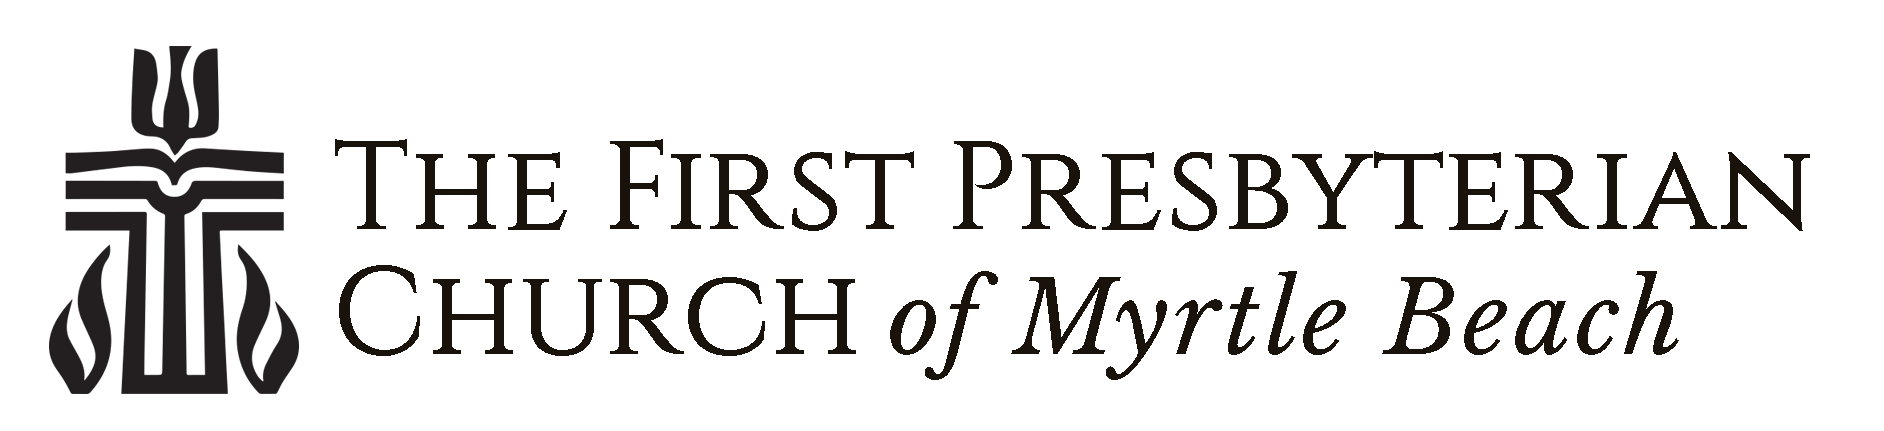 Home Myrtle Beach First Presbyterian Church